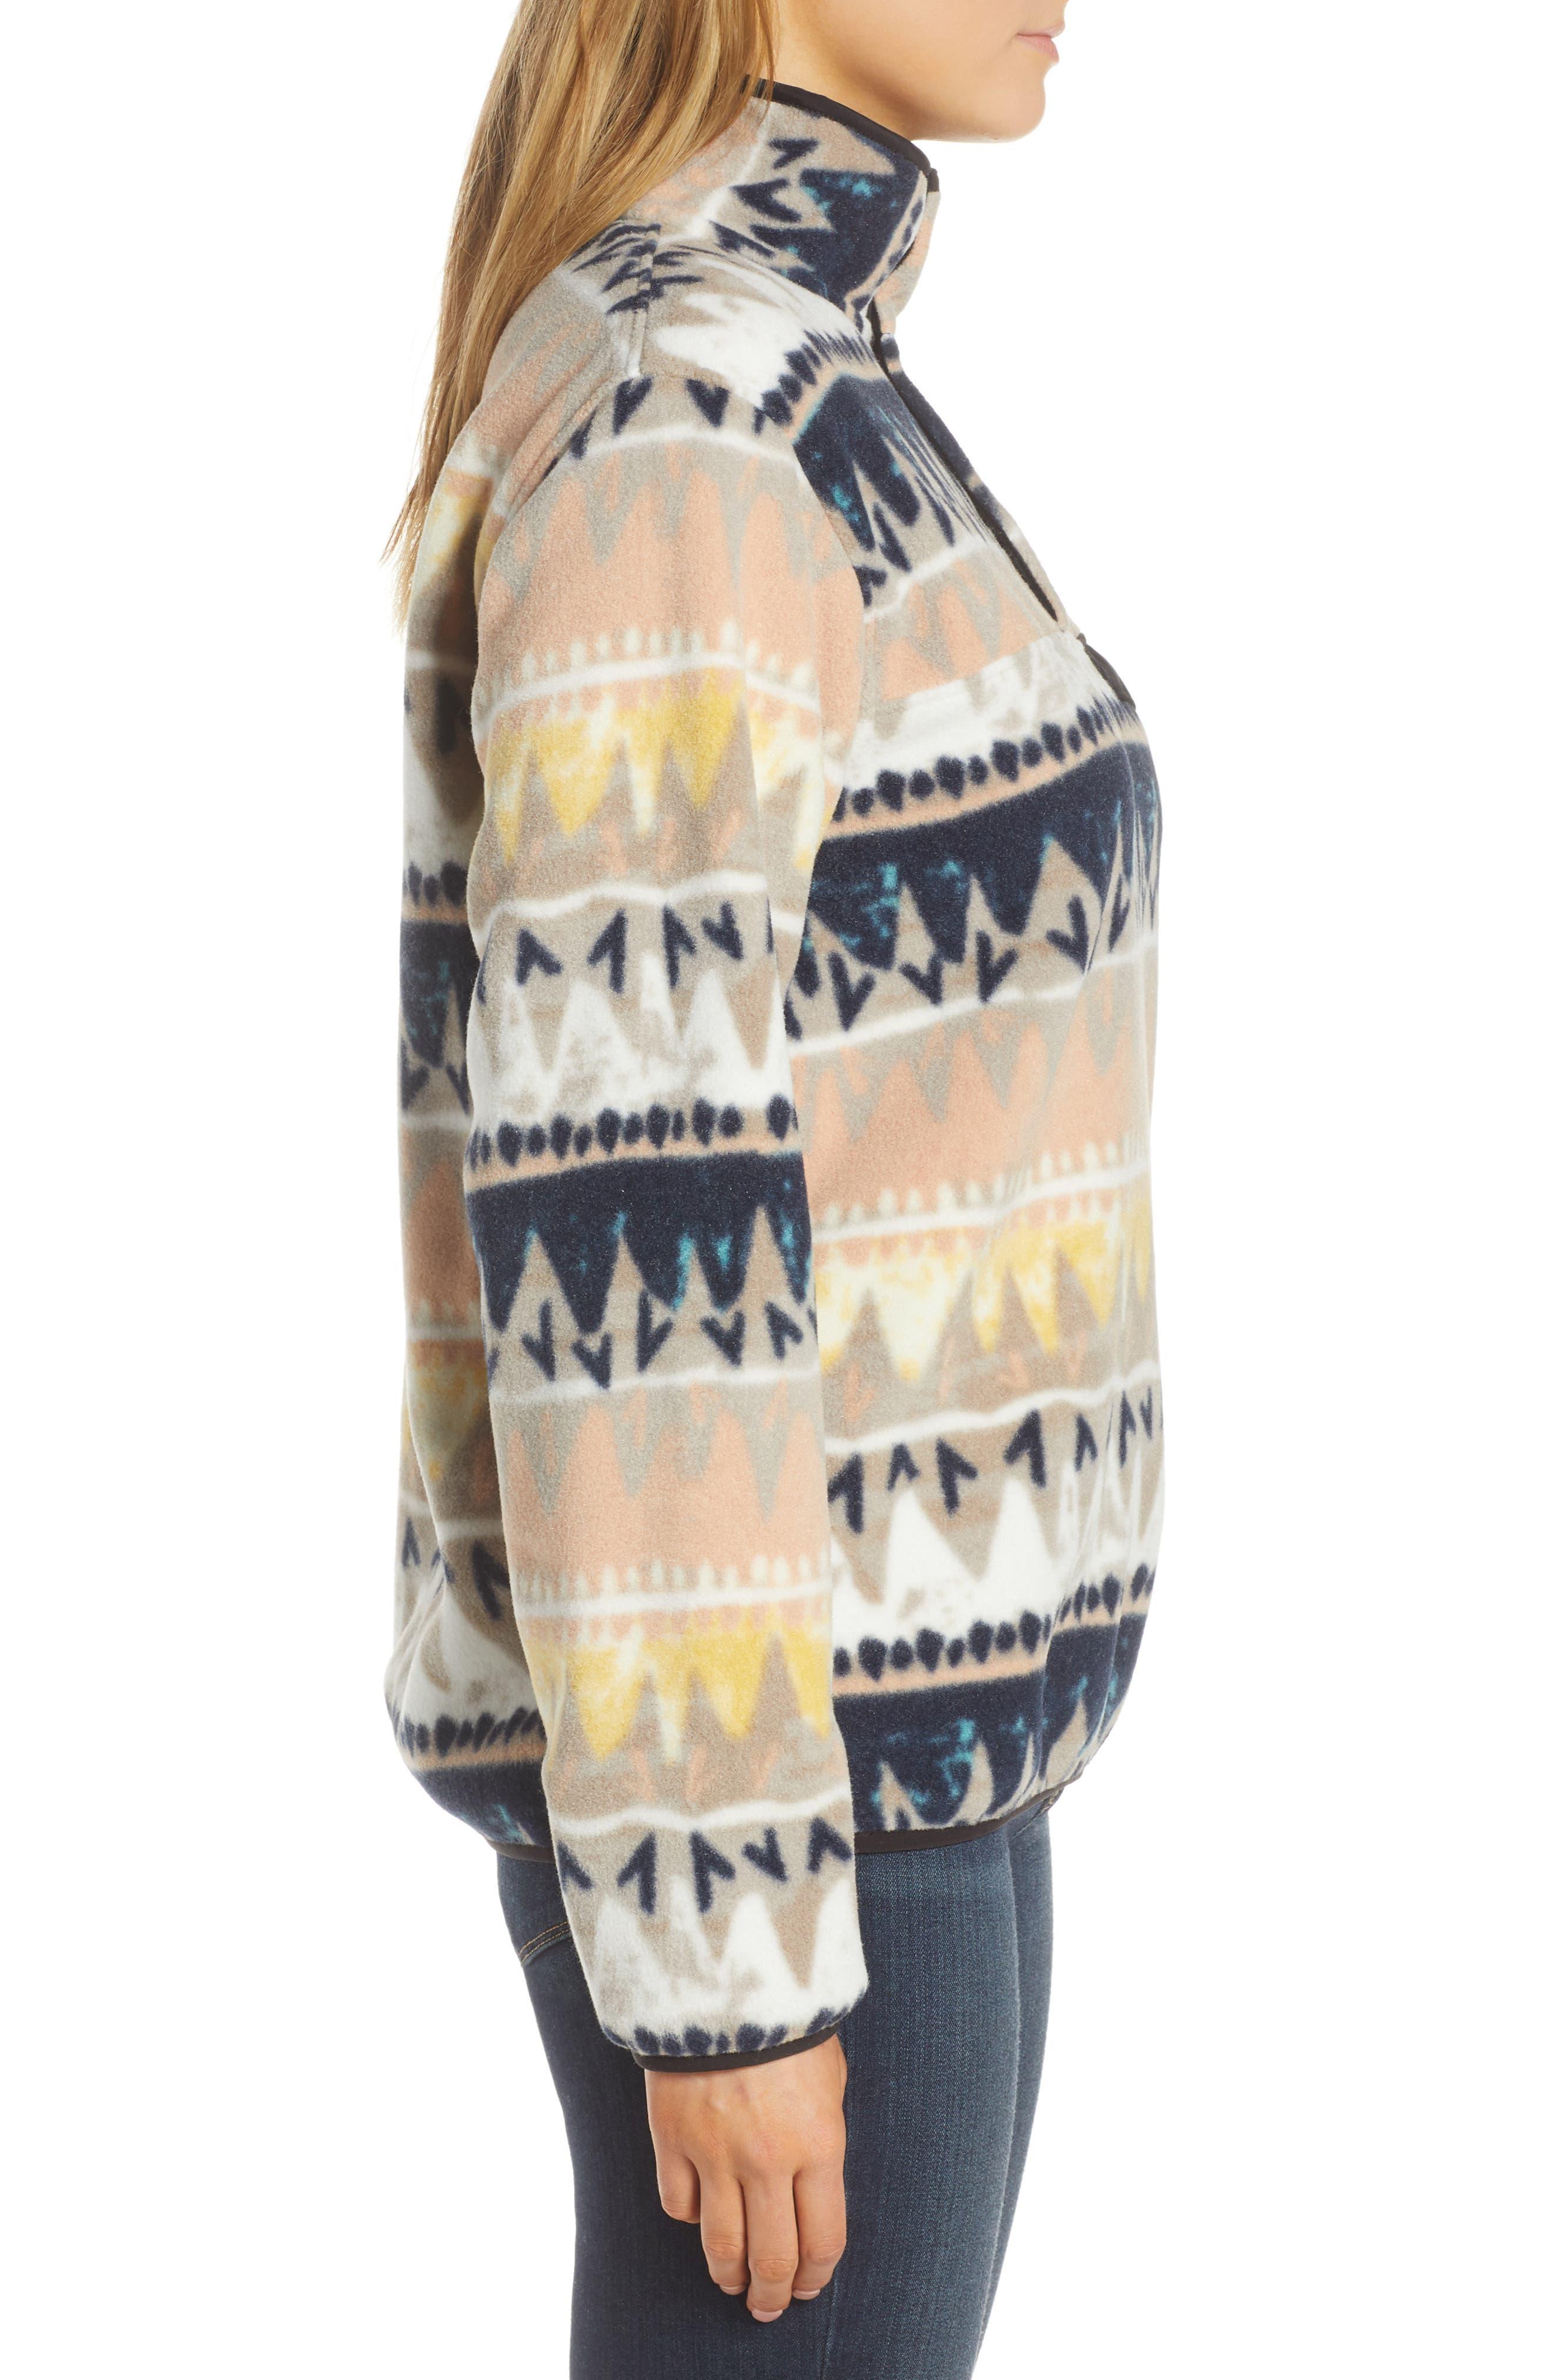 PATAGONIA, Synchilla Snap-T<sup>®</sup> Fleece Pullover, Alternate thumbnail 4, color, BANDICOOT/ MARROW GREY